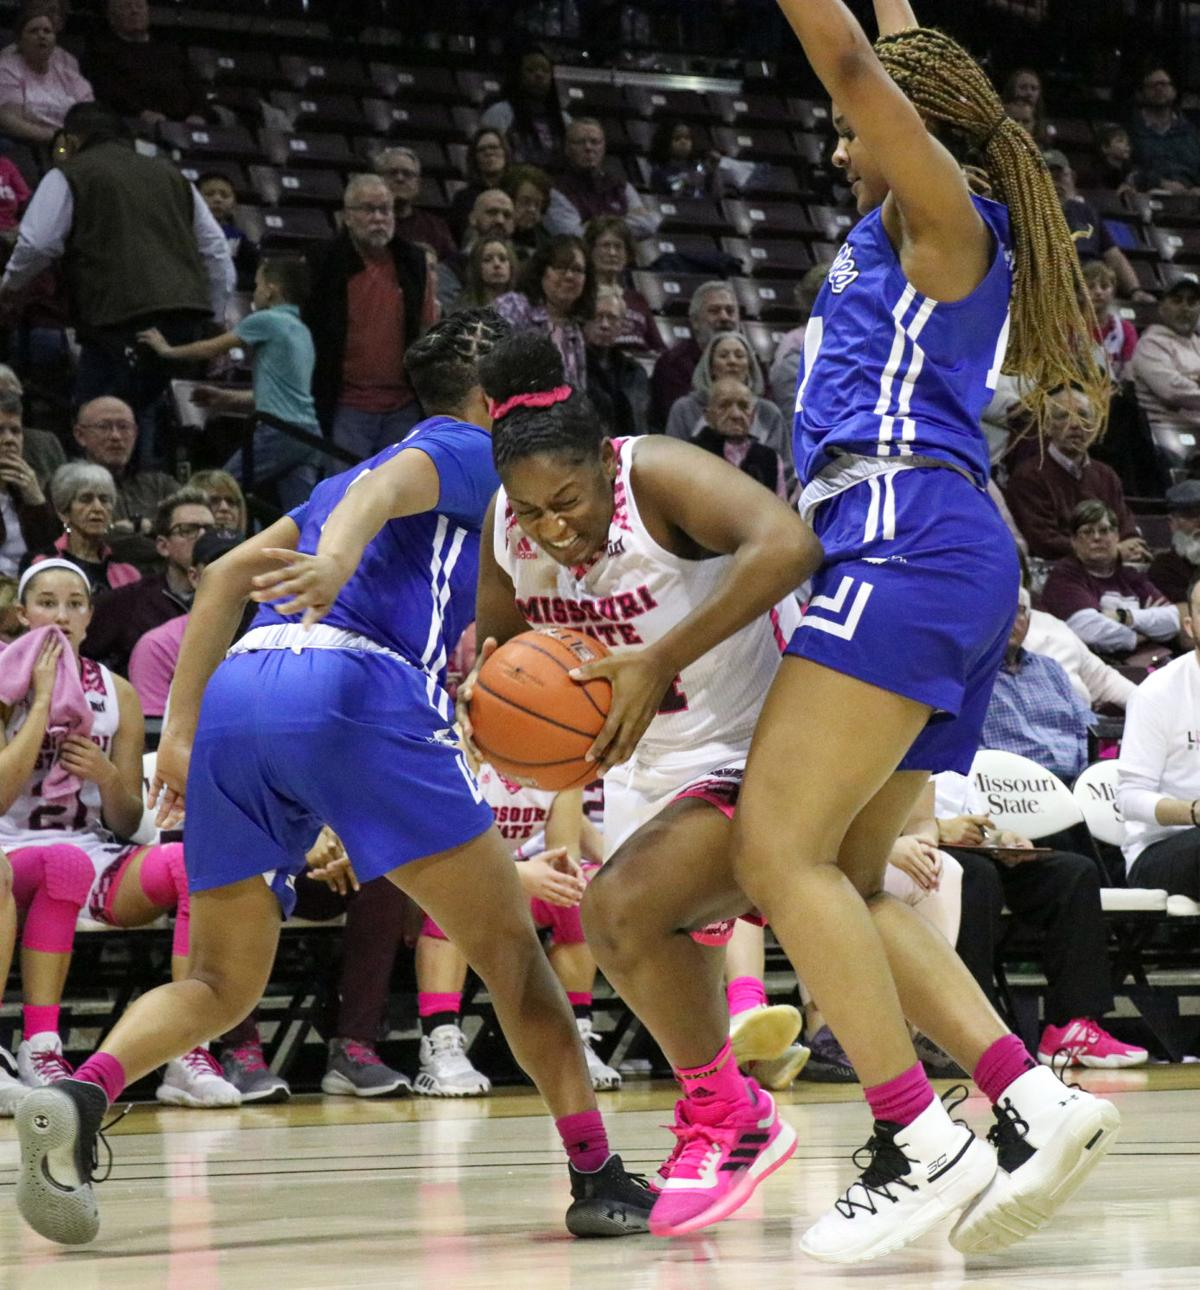 Bri Eillis pushes past her opponents